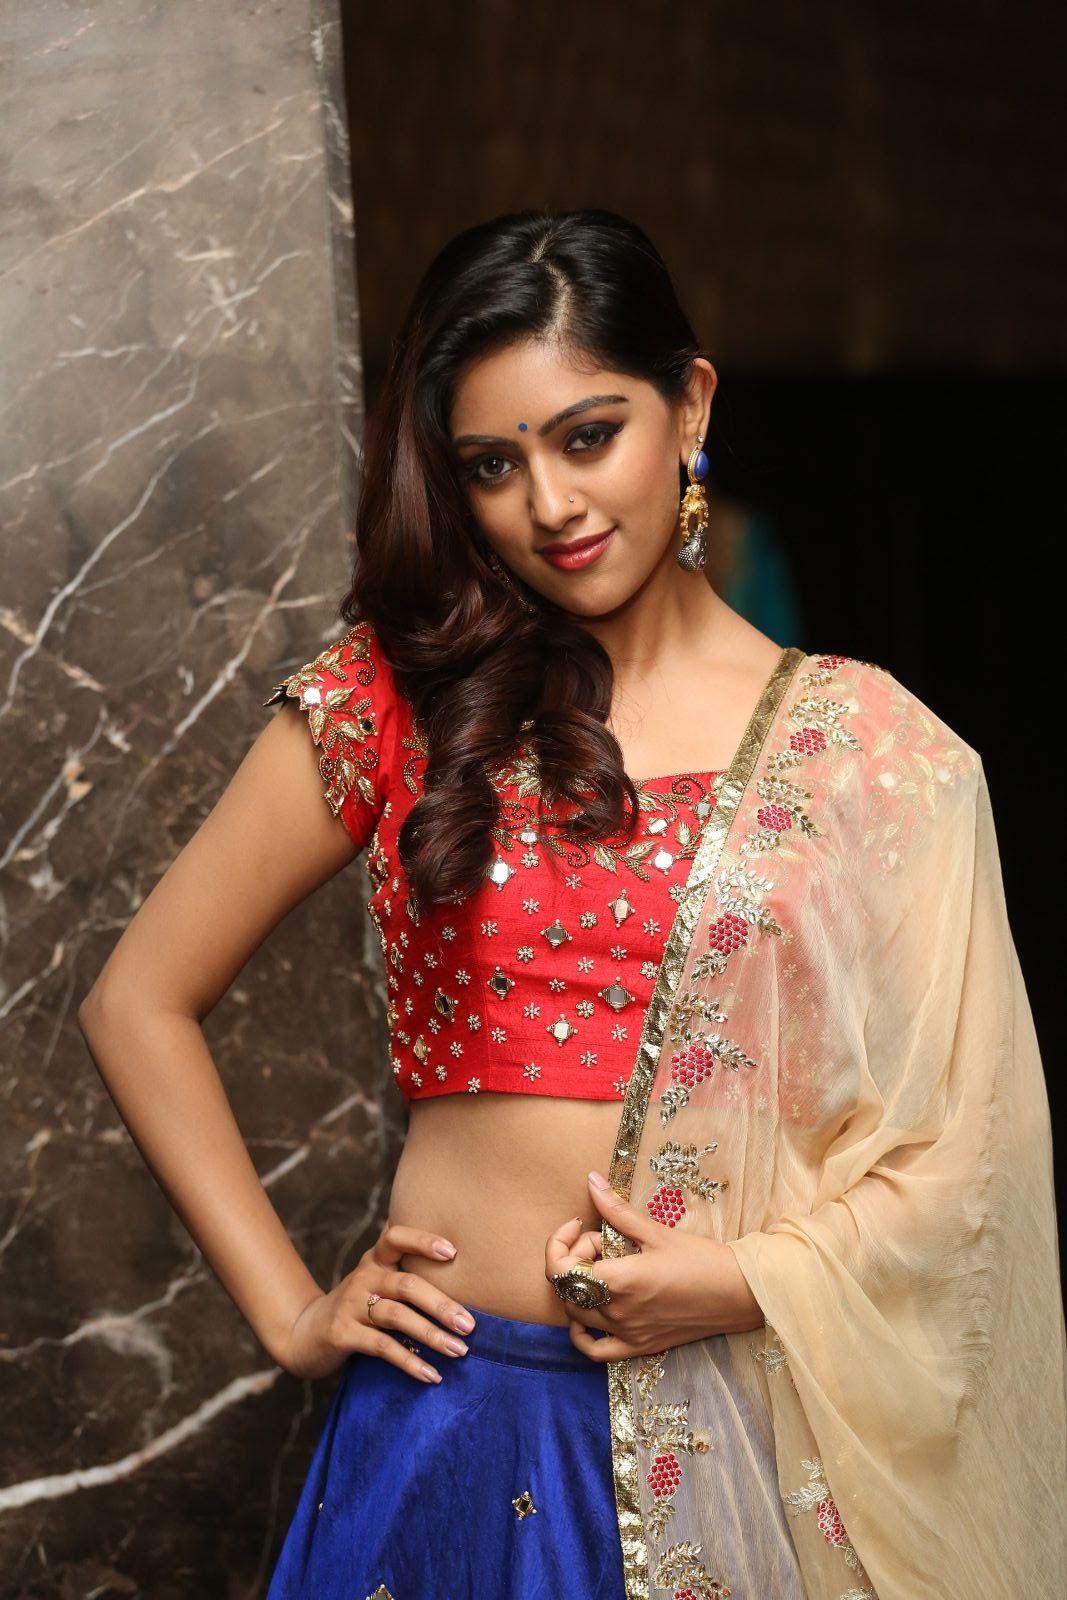 Anu Emmanuel Is An Indian Film Actress From Usa She Made Her Acting Debut As A Child Artist In The Malayalam Film Swa Anu Emmanuel Actresses Malayalam Actress